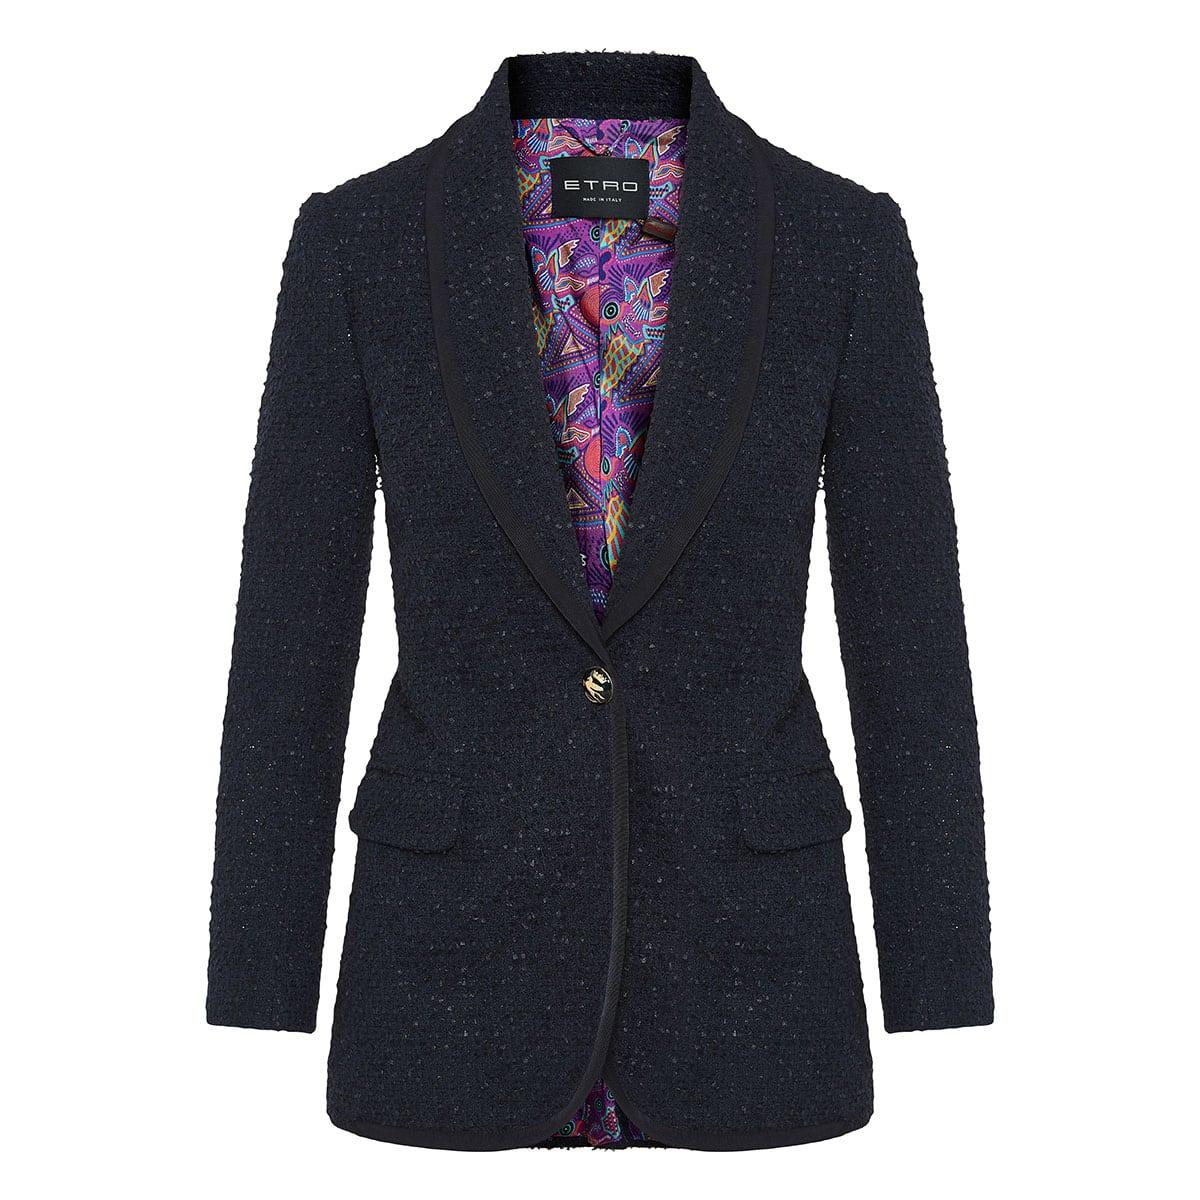 Single-breasted bouclé blazer